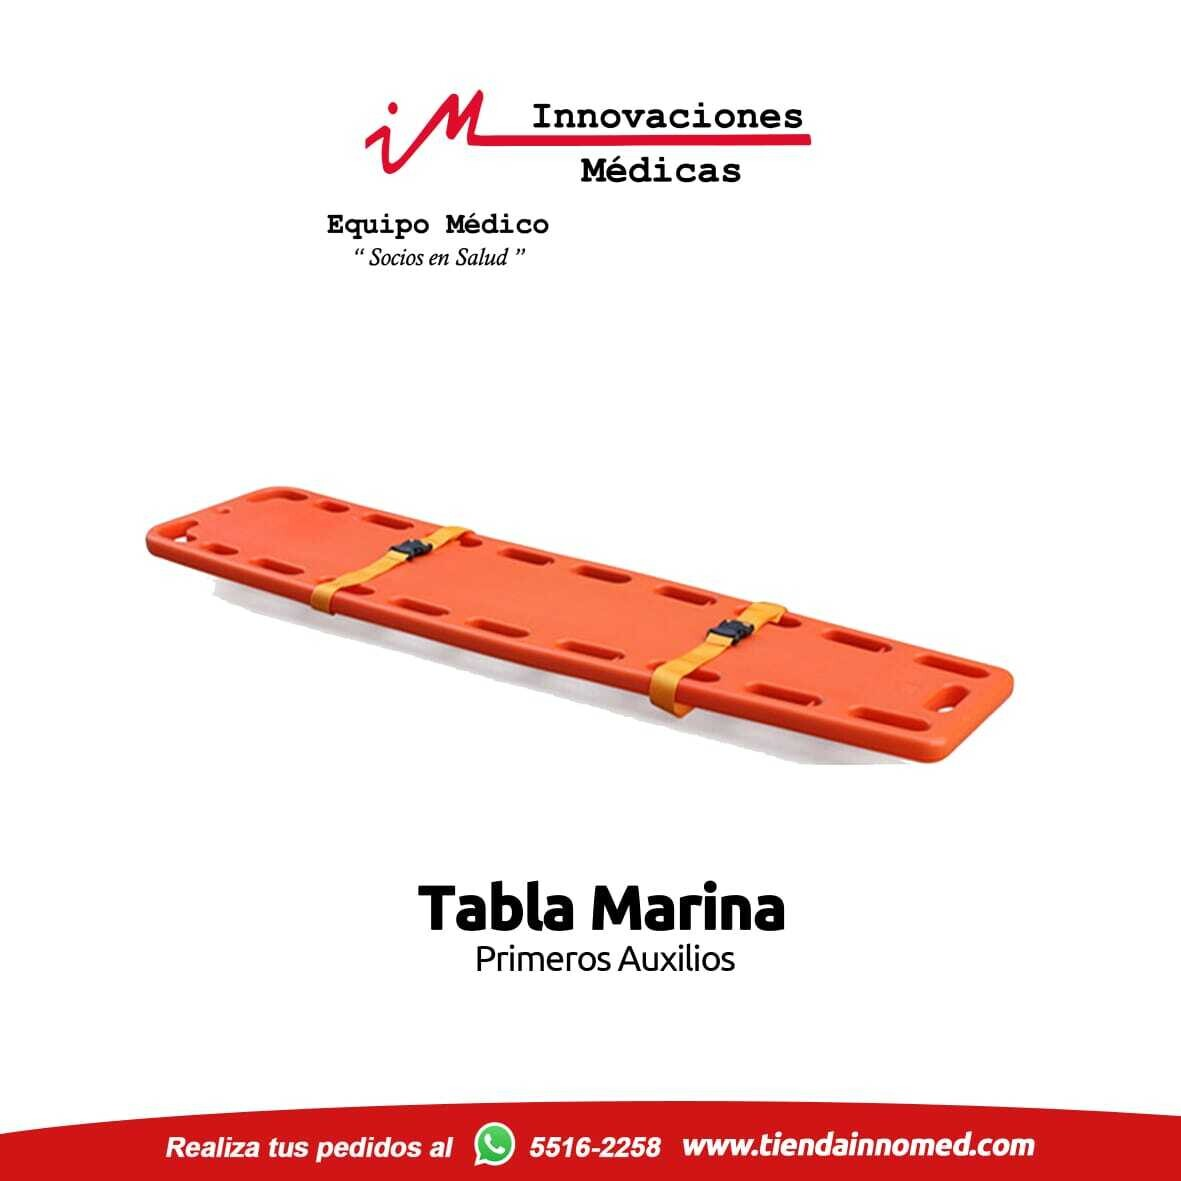 Tabla Marina